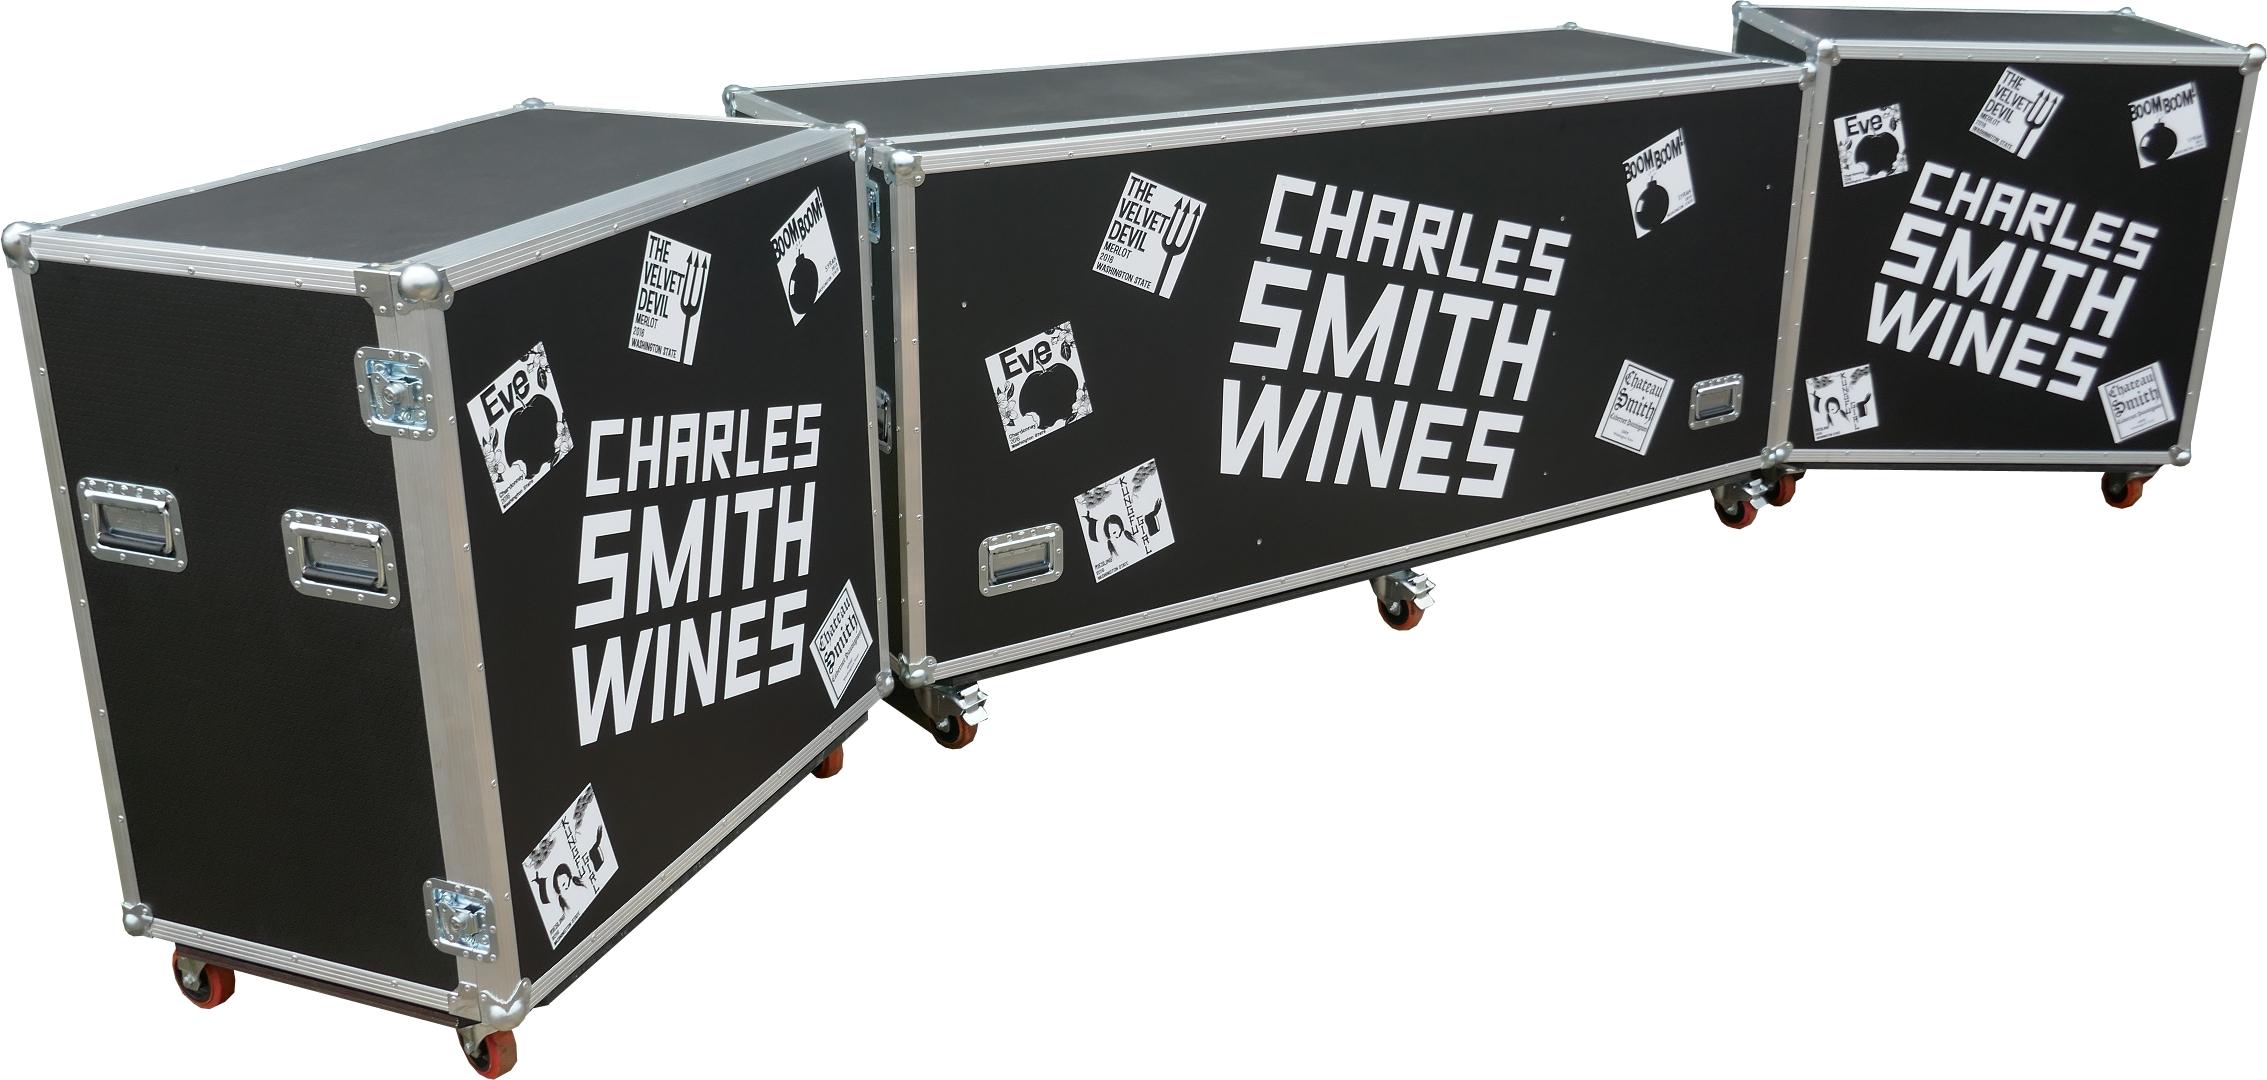 Charles Smith Wine Cases